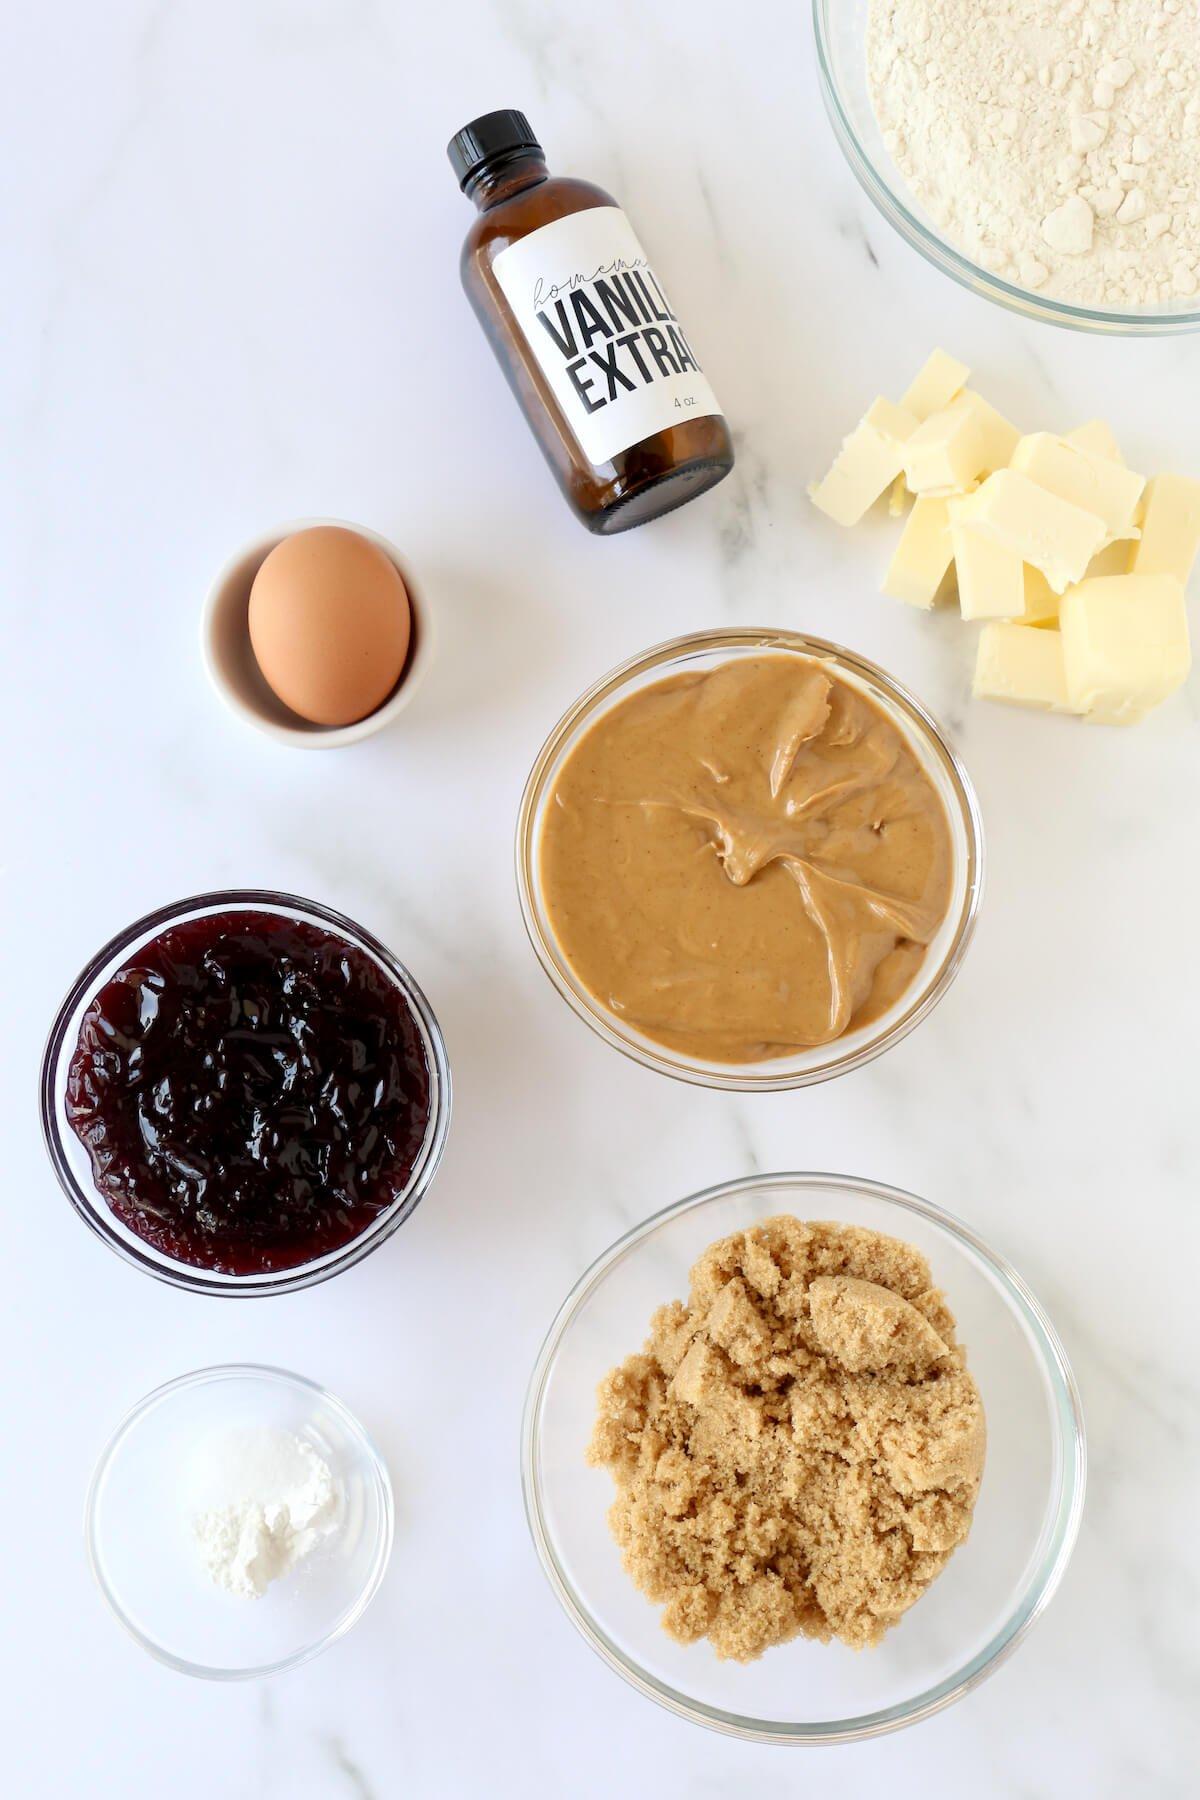 Bowls of flour, peanut butter, grape jelly, brown sugar, an egg and baking powder.